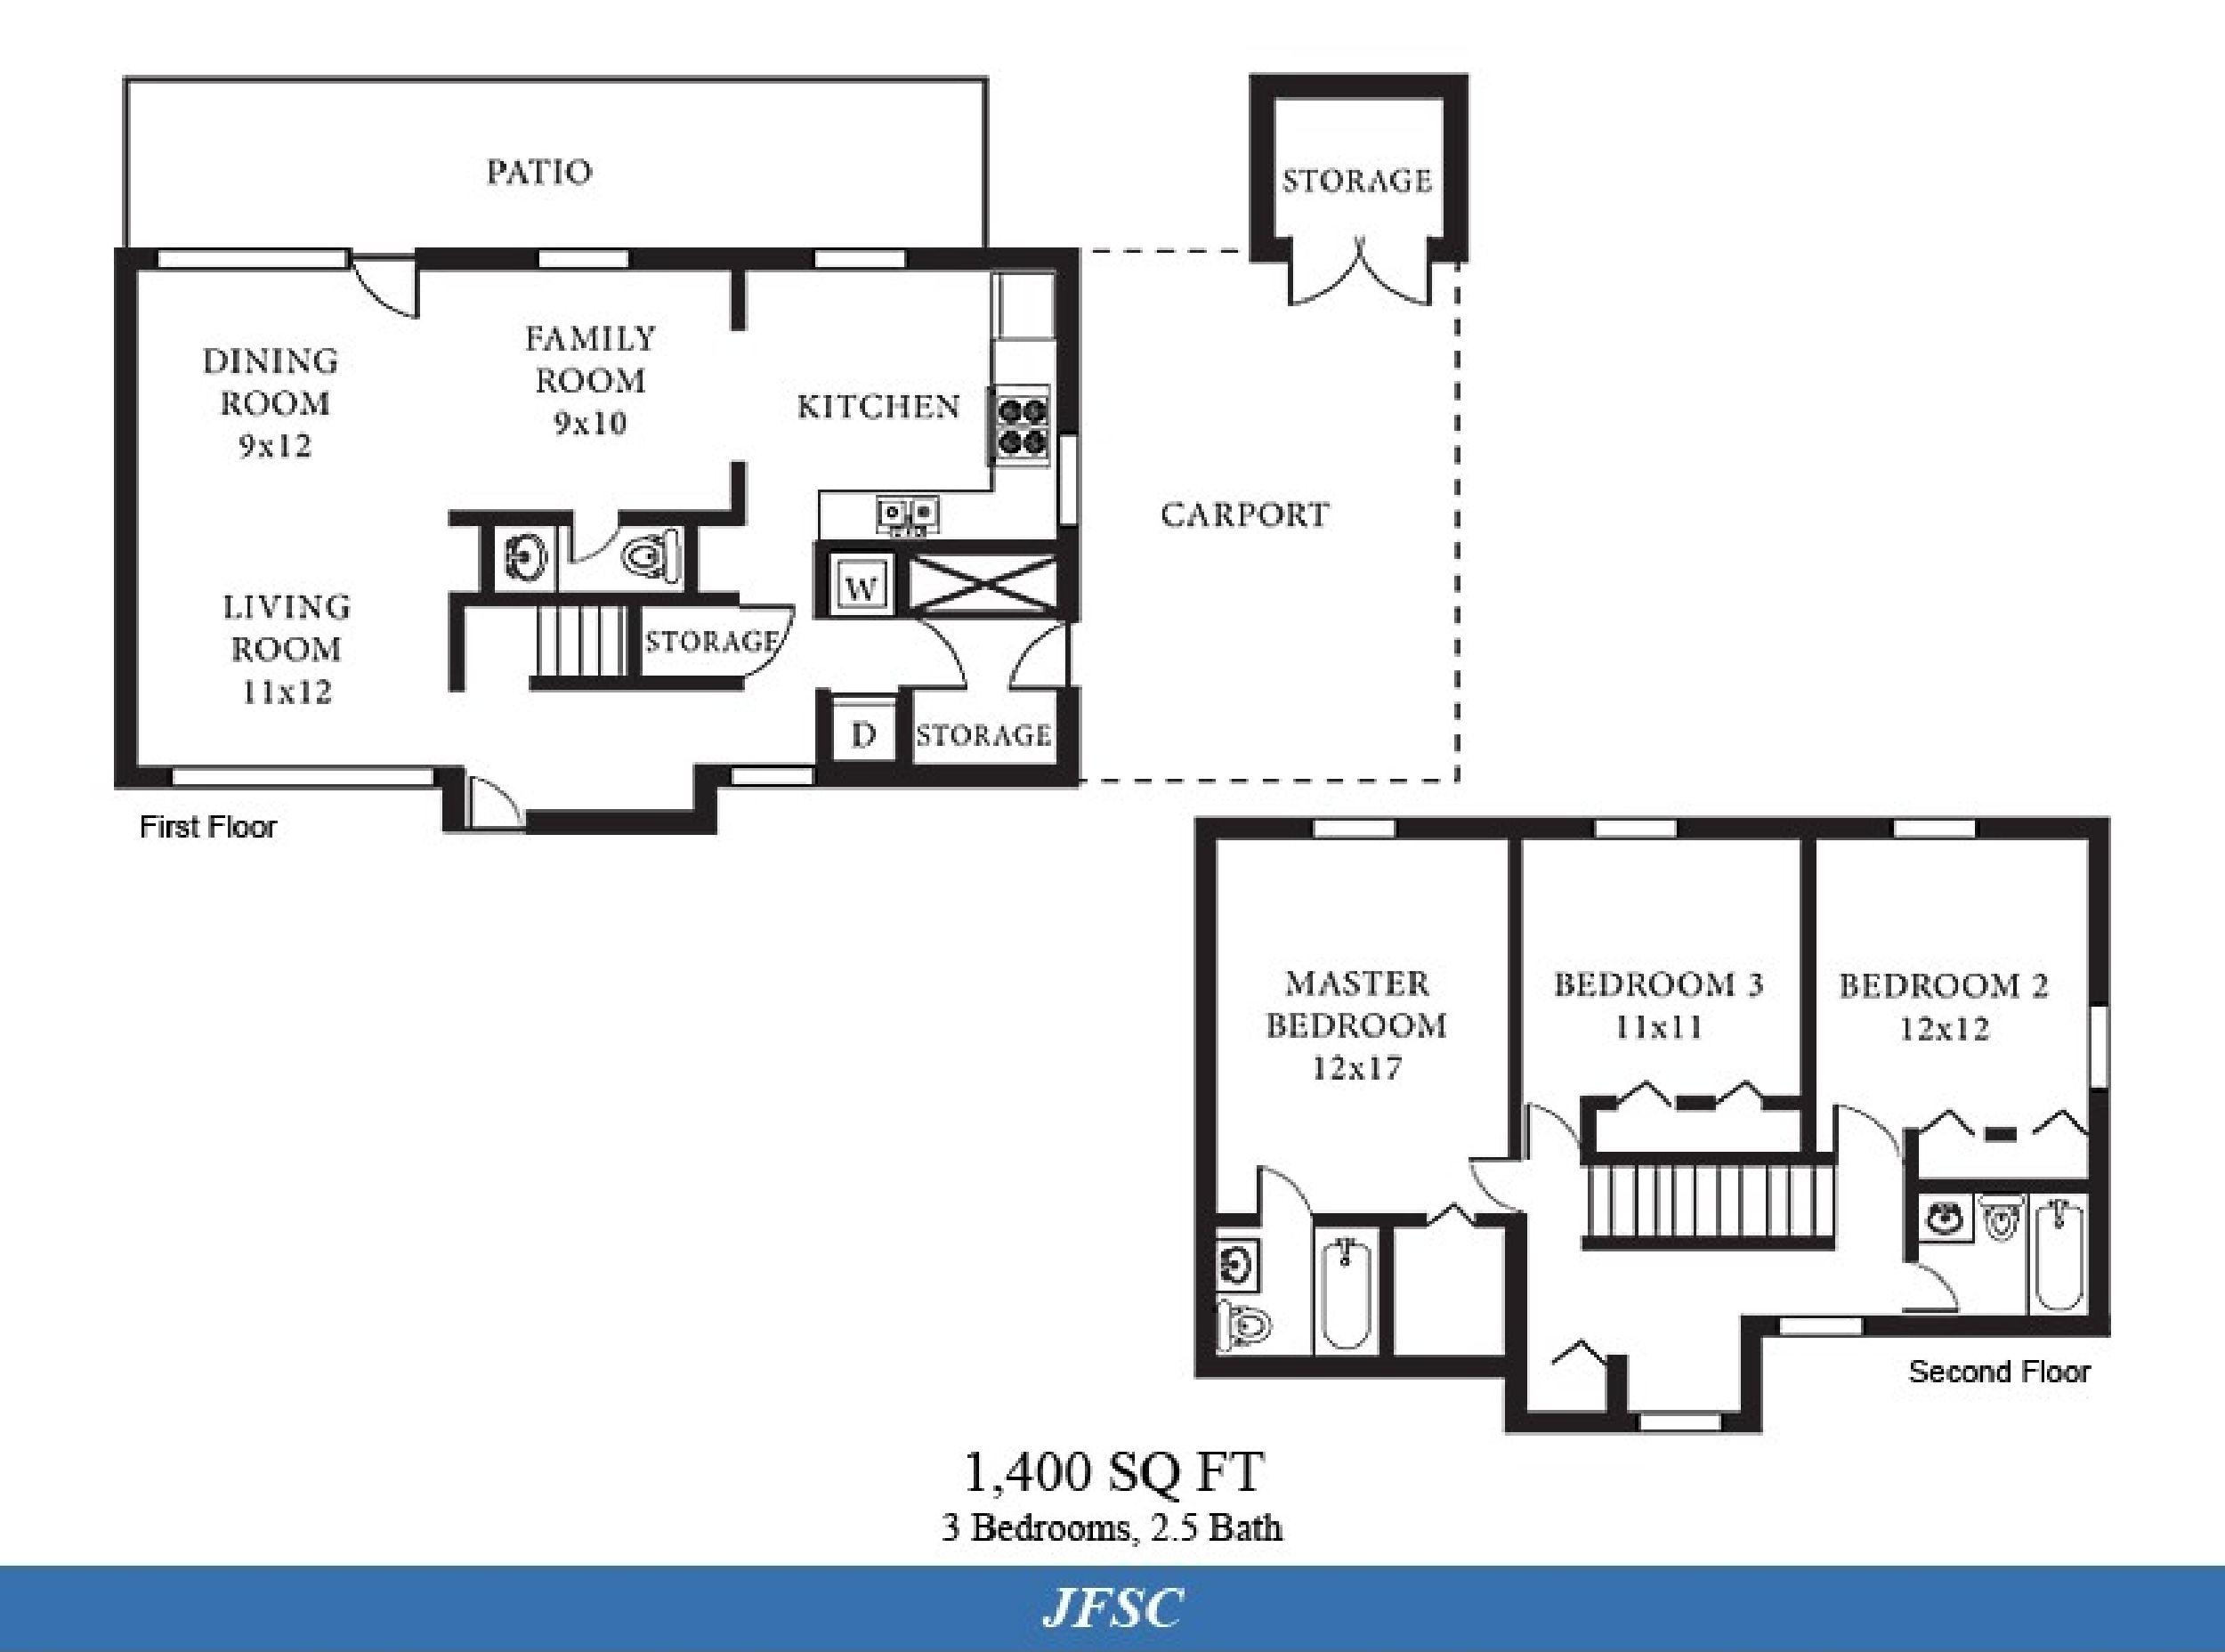 Ns Norfolk Jfsc Neighborhood 3 Bedroom 2 5 Bath Home